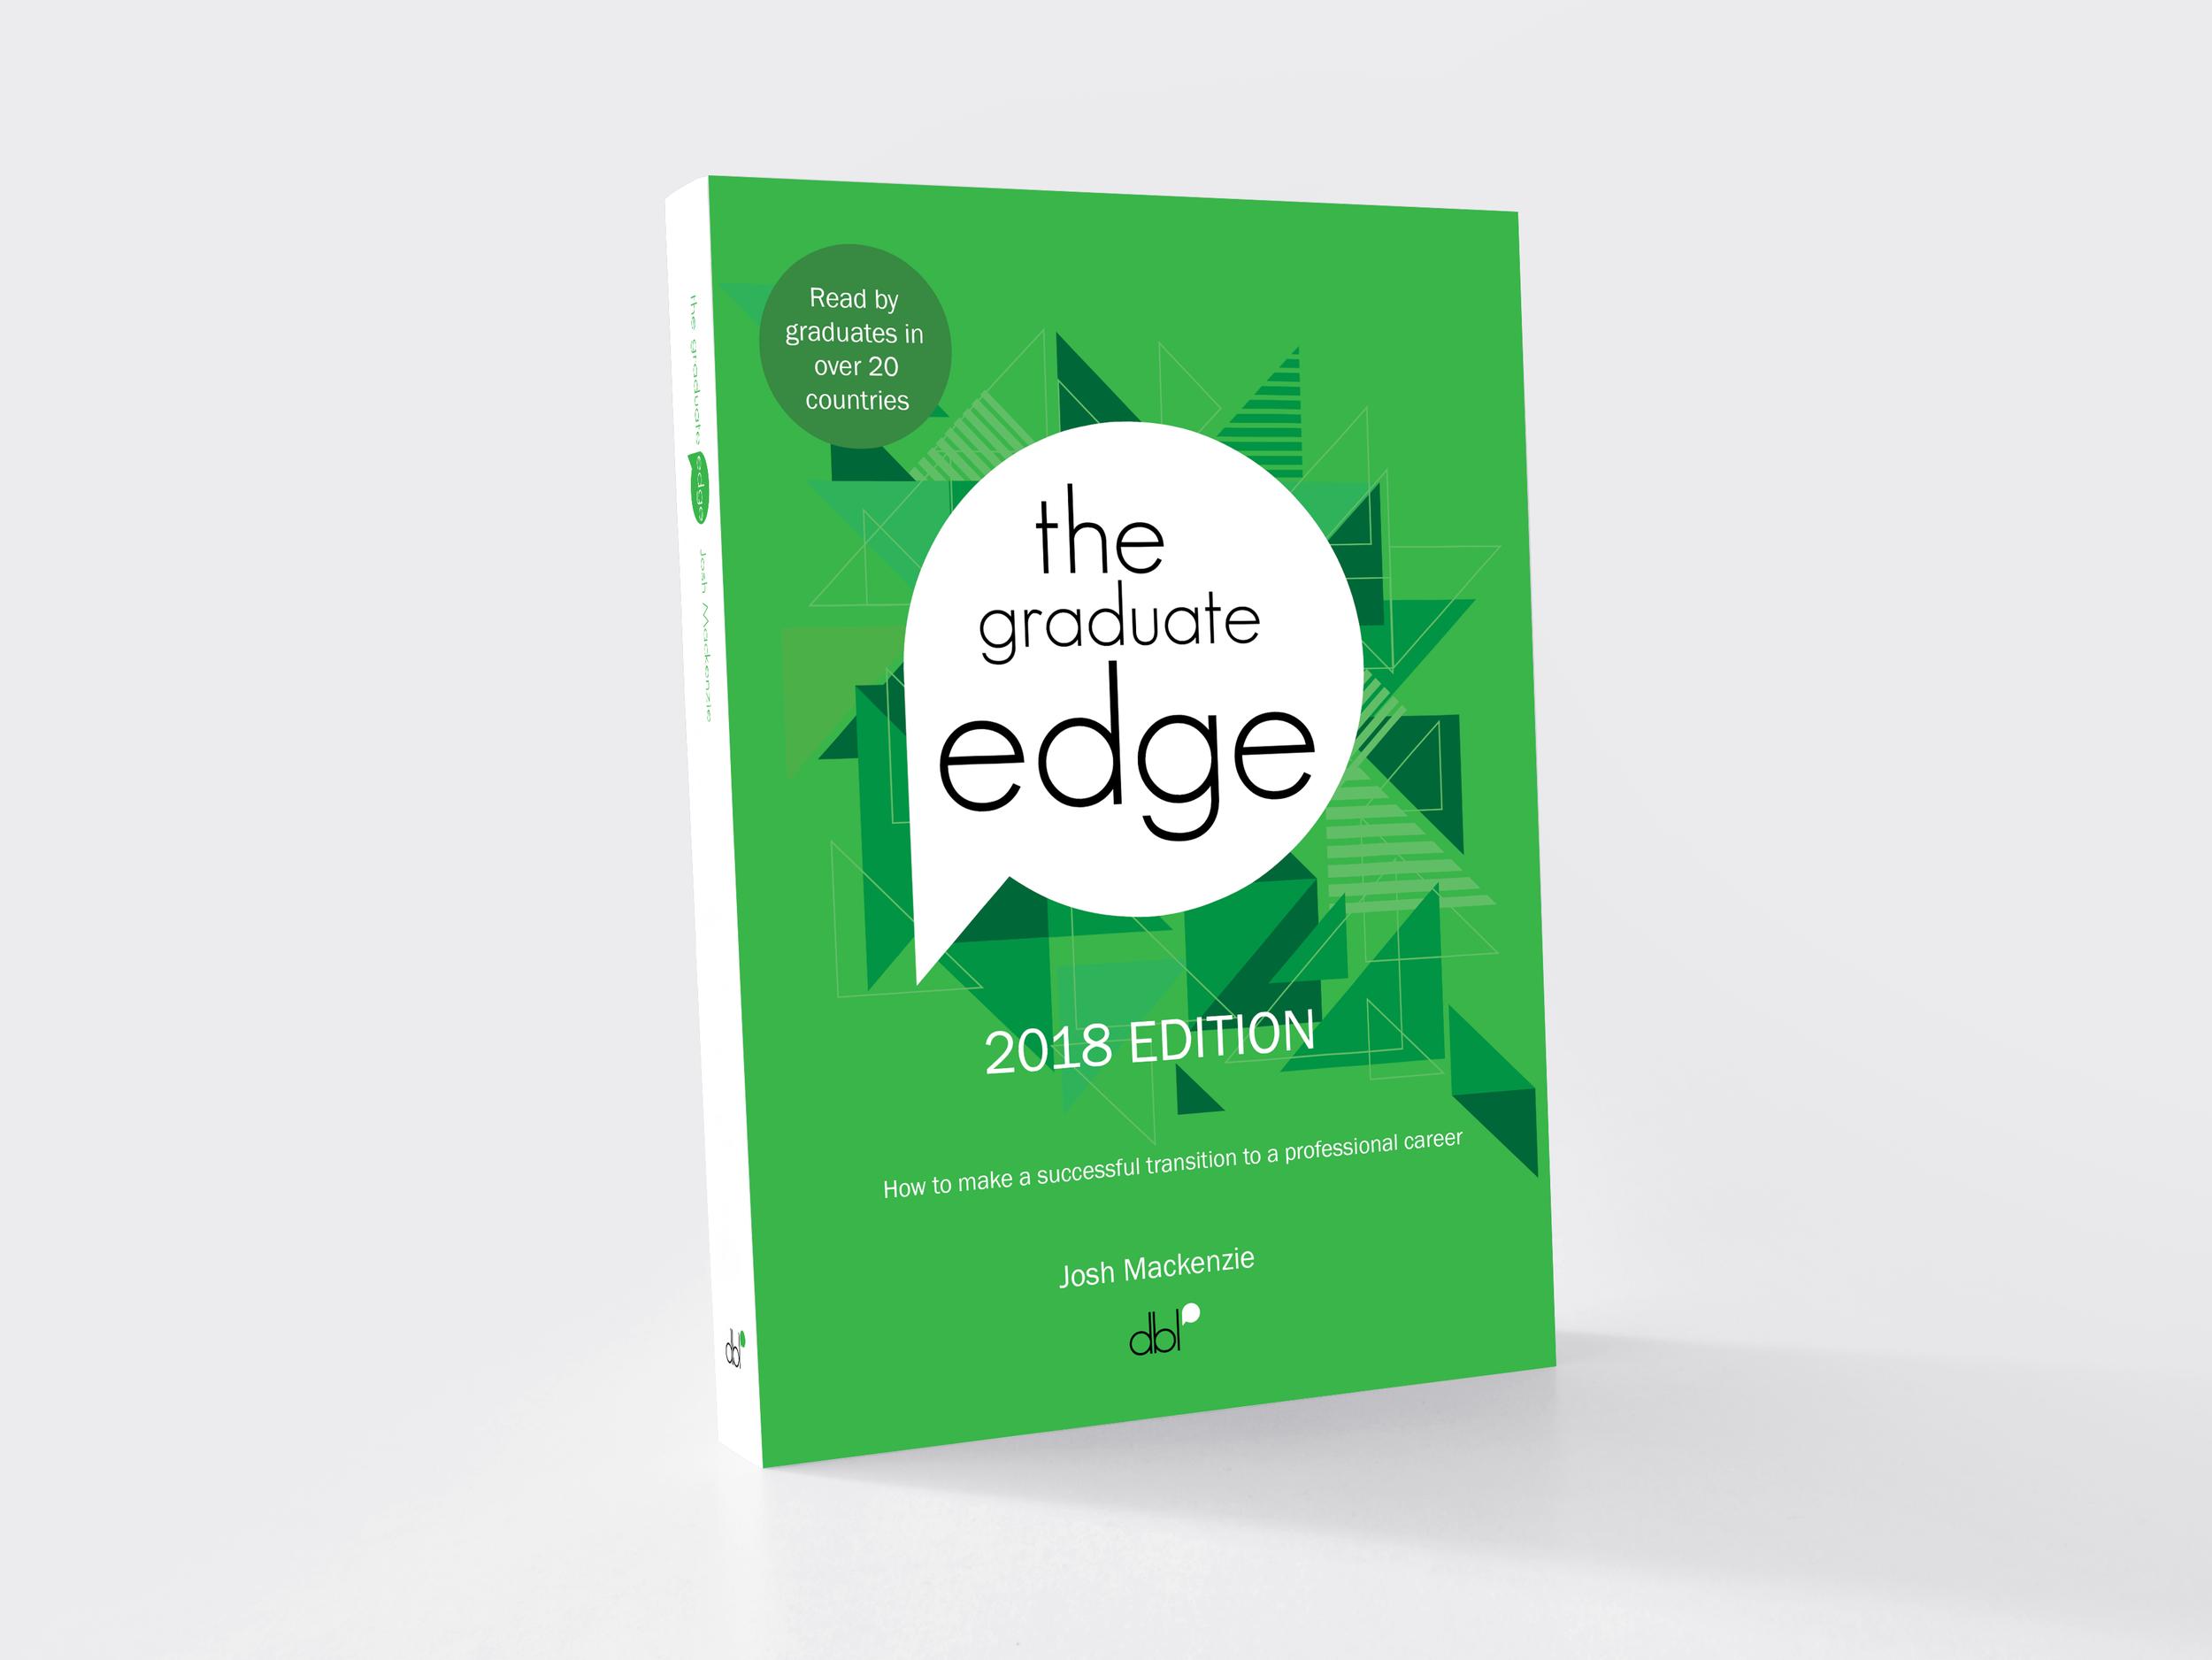 Graduate-Edge-Book-2018-Edition3_3D (1).png